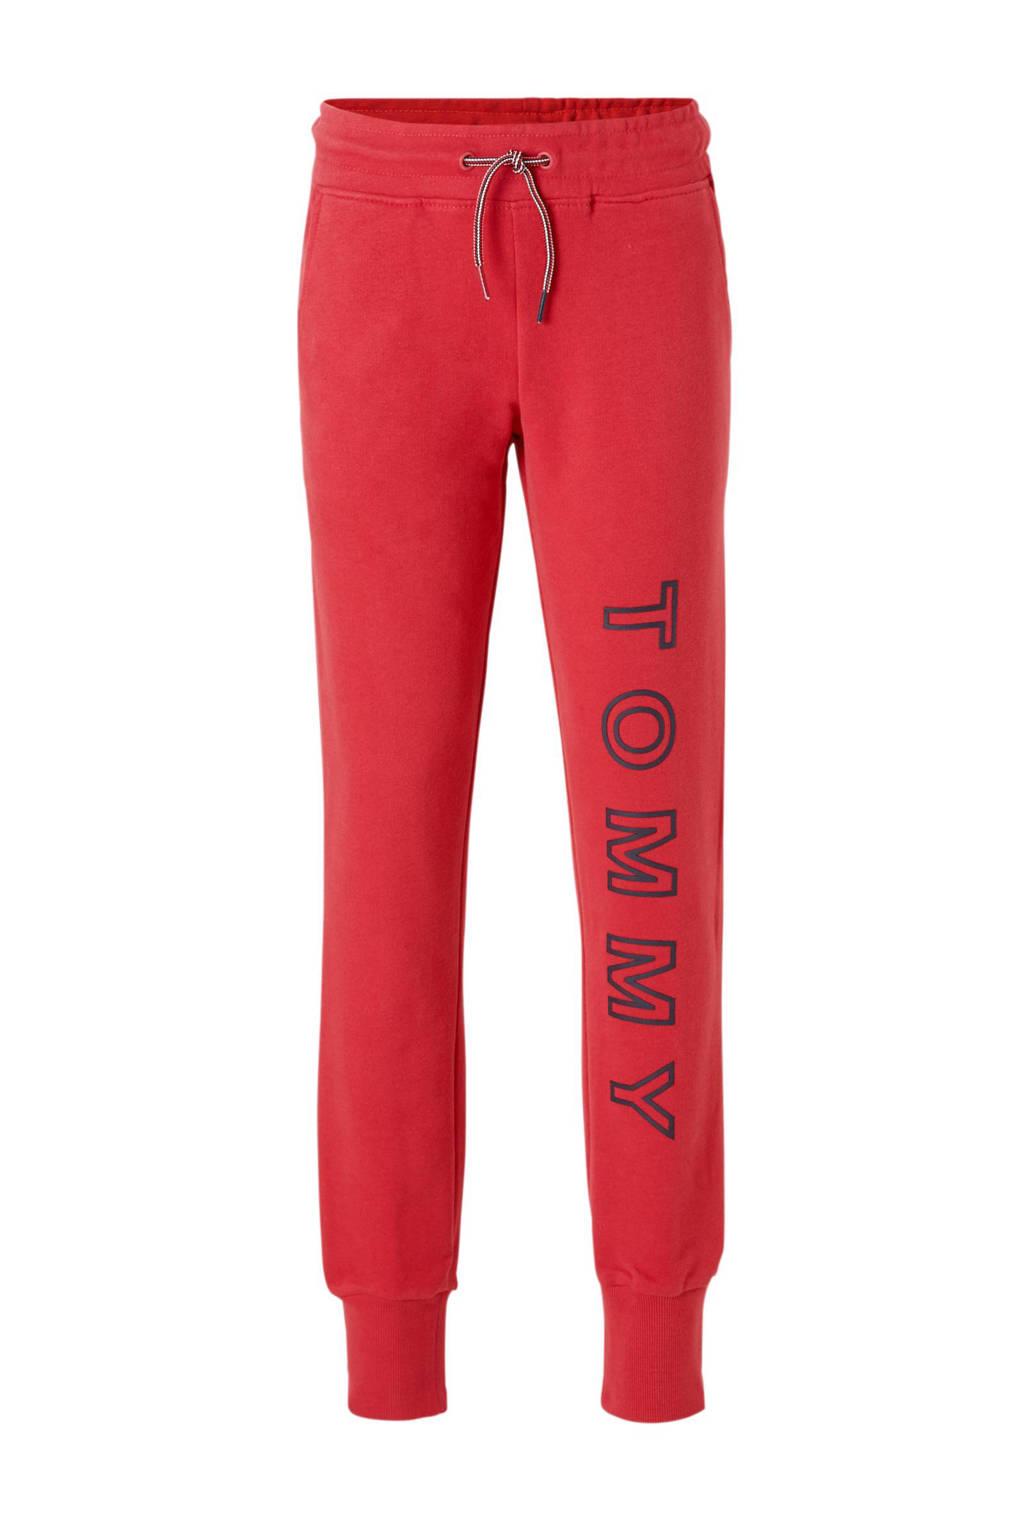 Tommy Hilfiger sweatpants met logo roze, Framboosroze